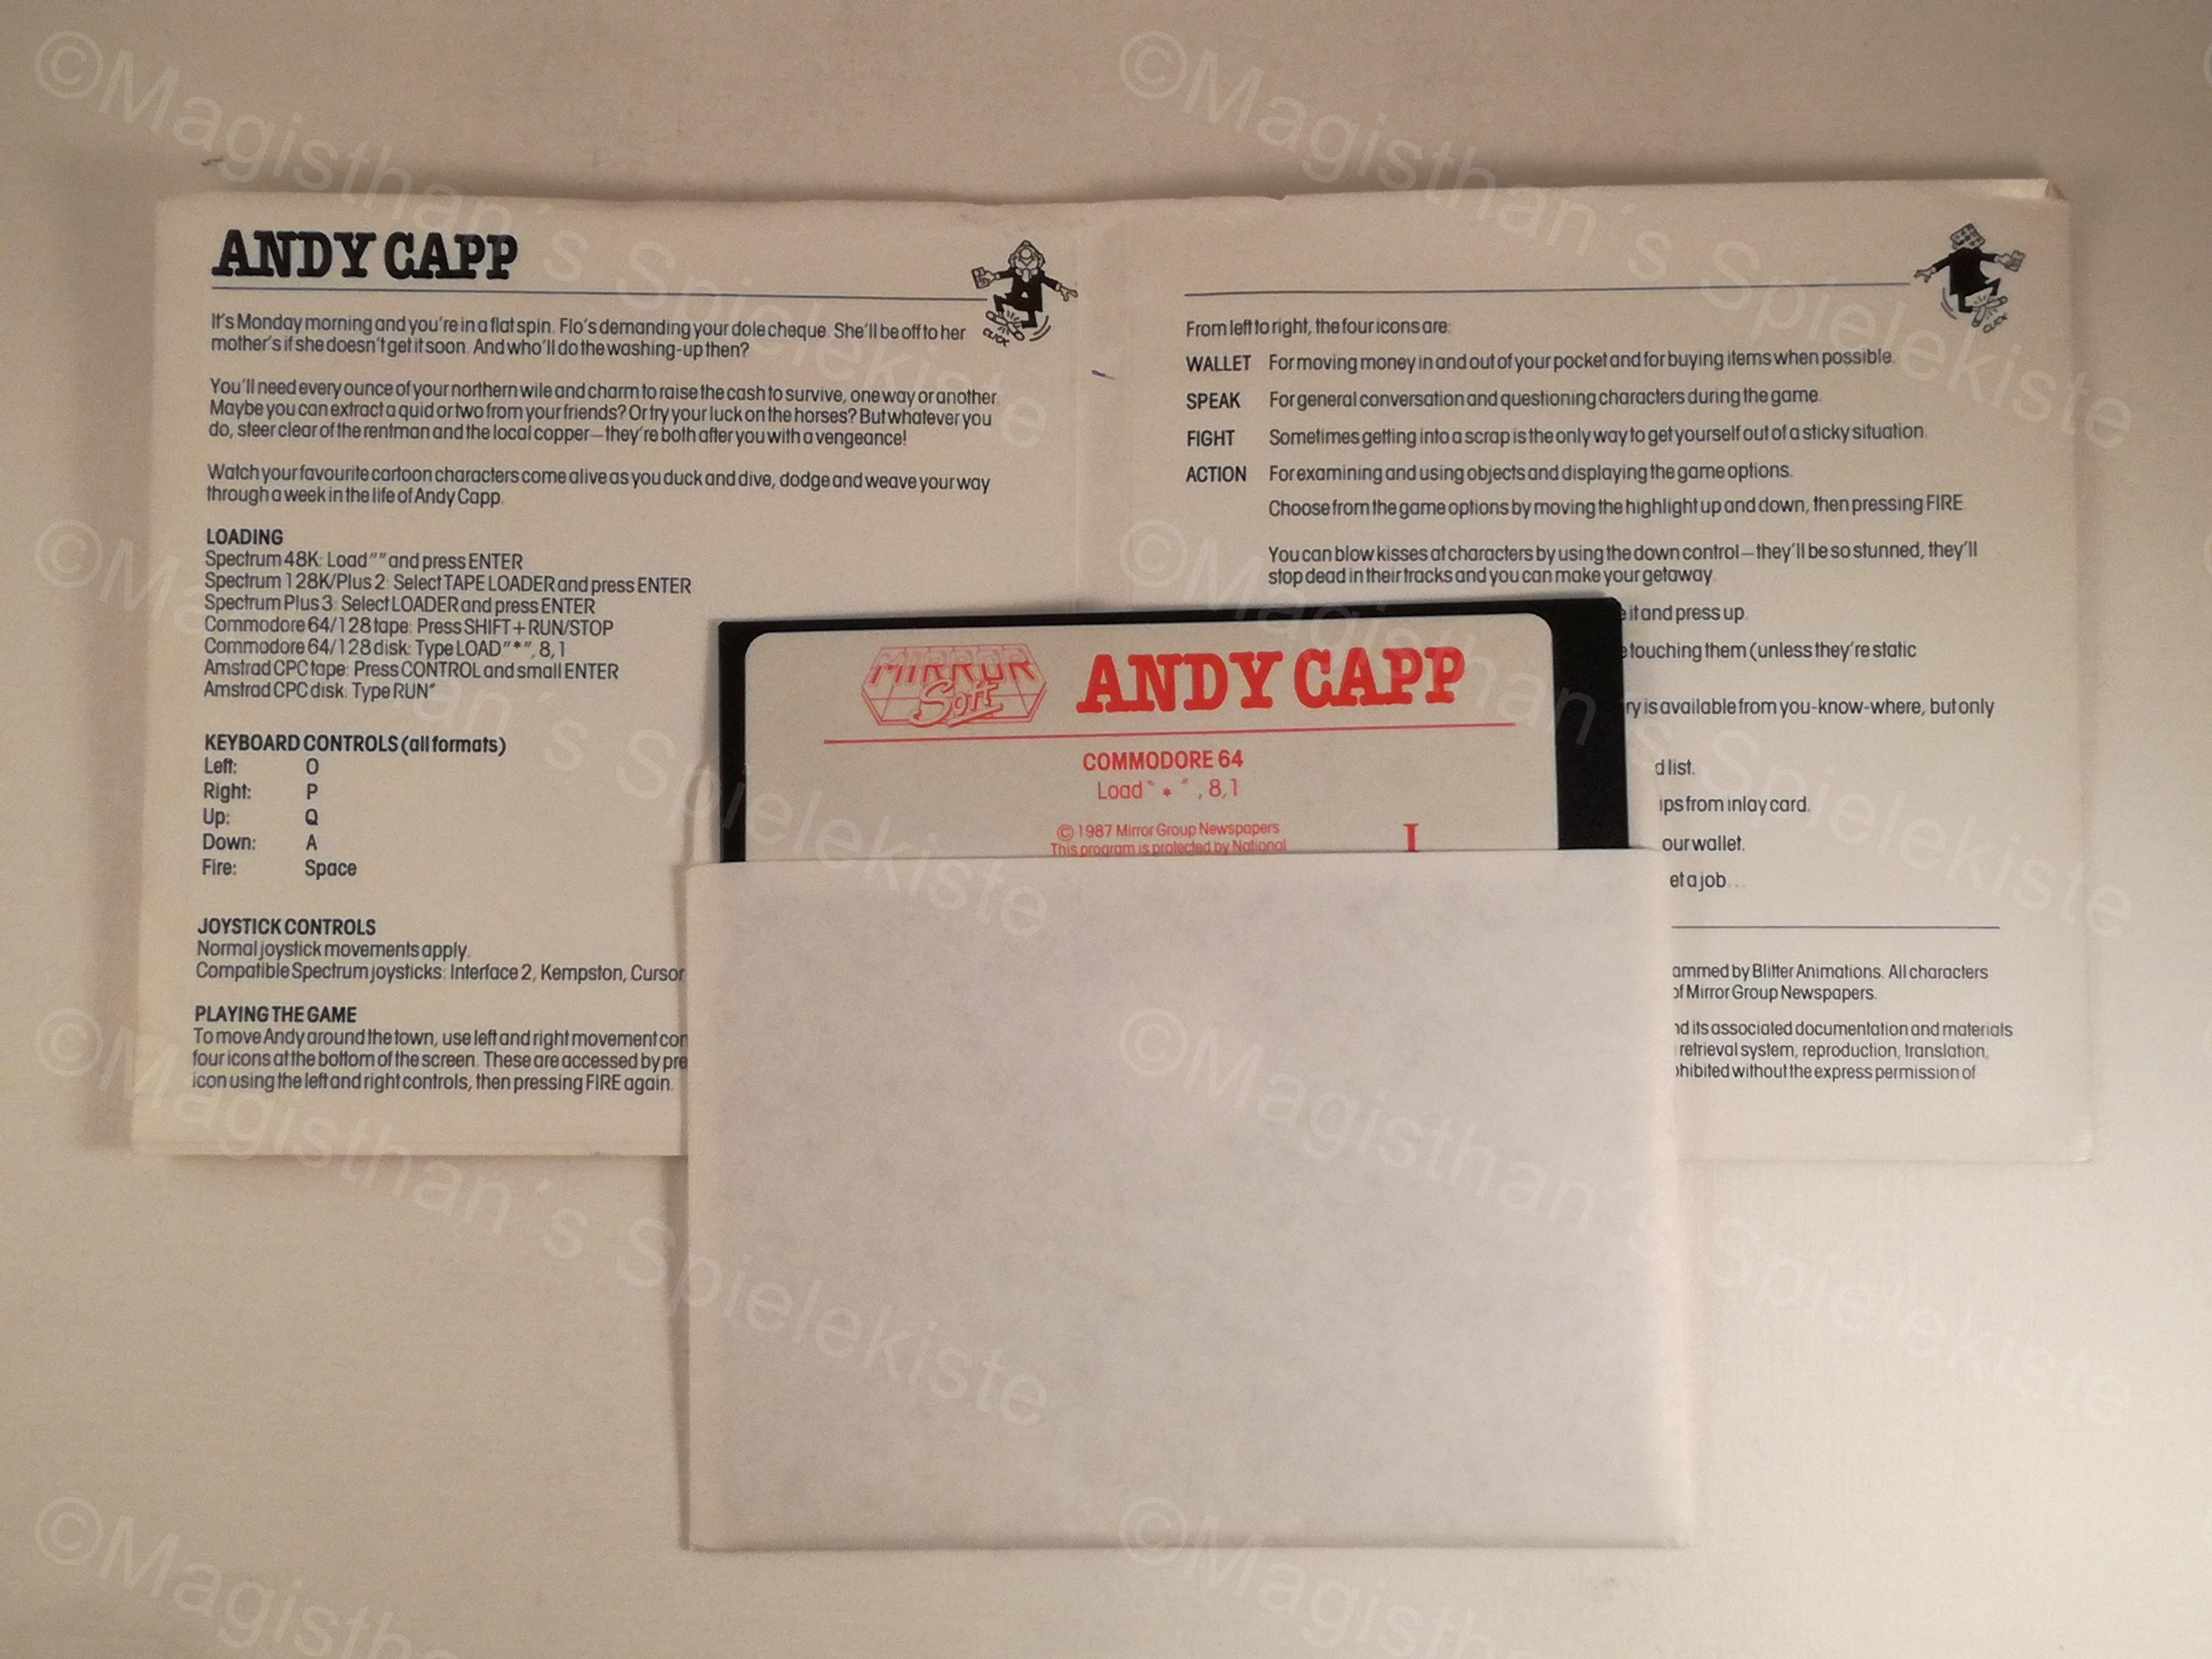 AndyCapp2.jpg